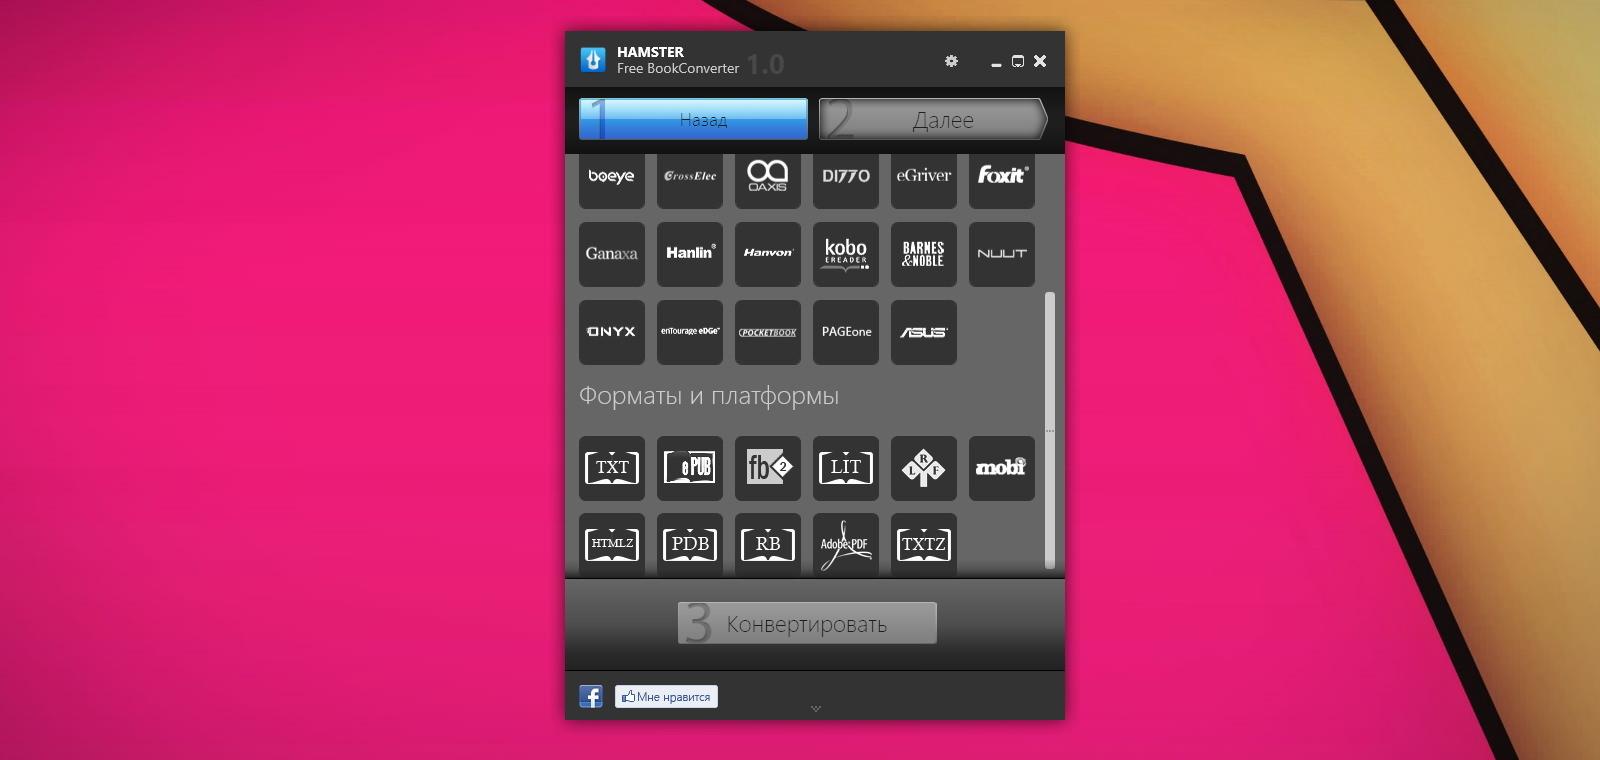 Hamster Free eBook Converter — удобная программа для конвертации электронных книг в разные форматы